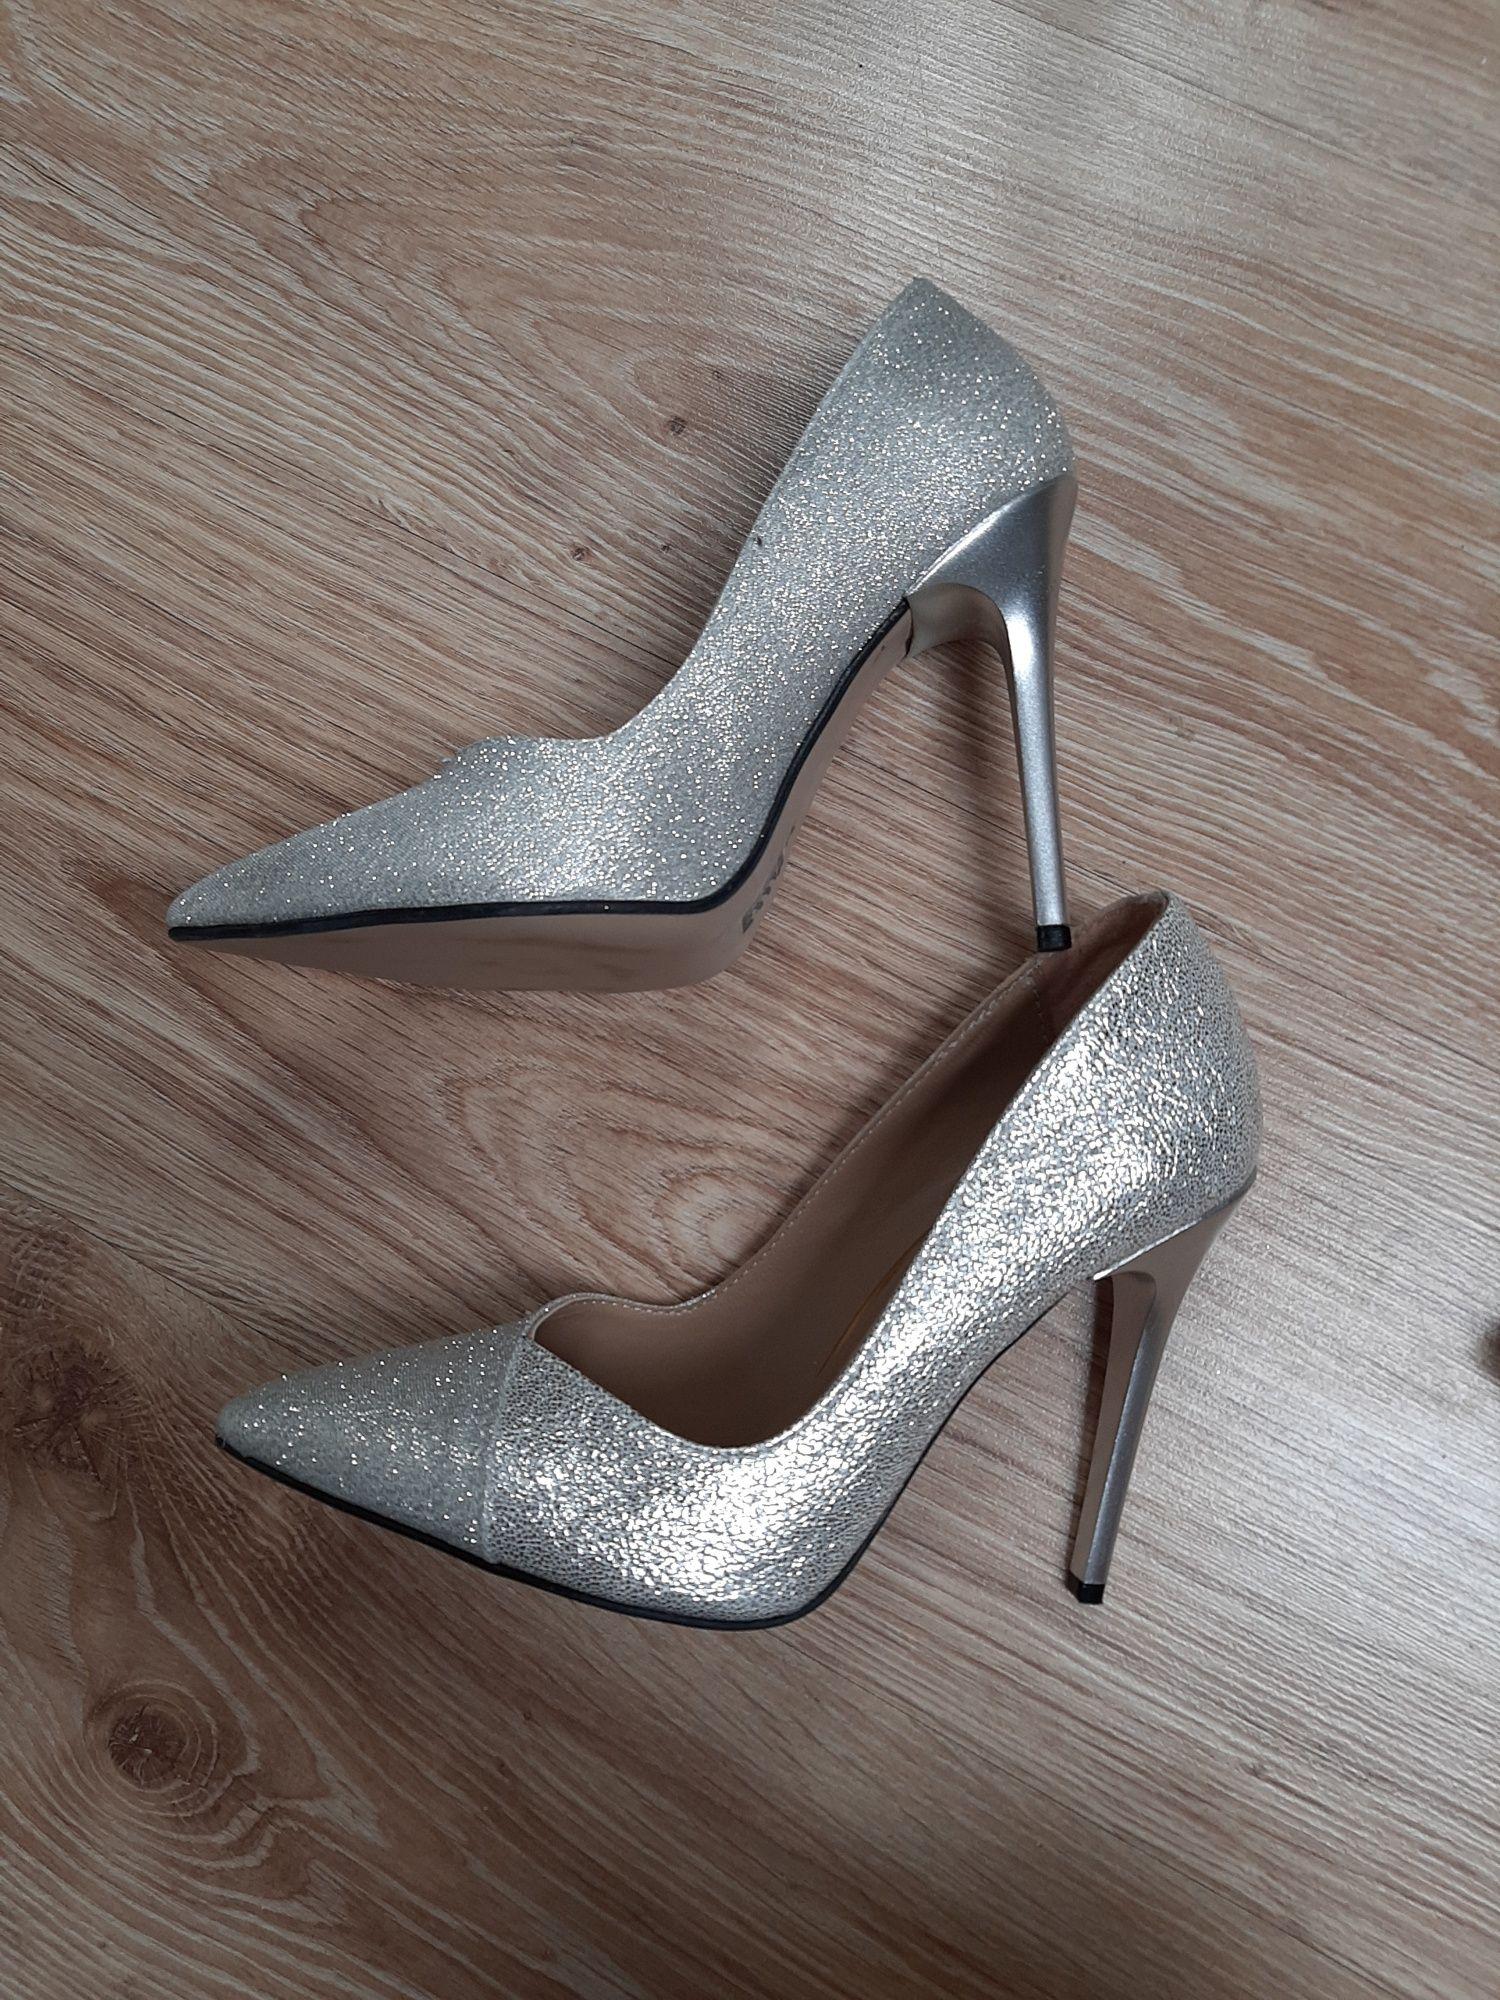 Pantofi argintii